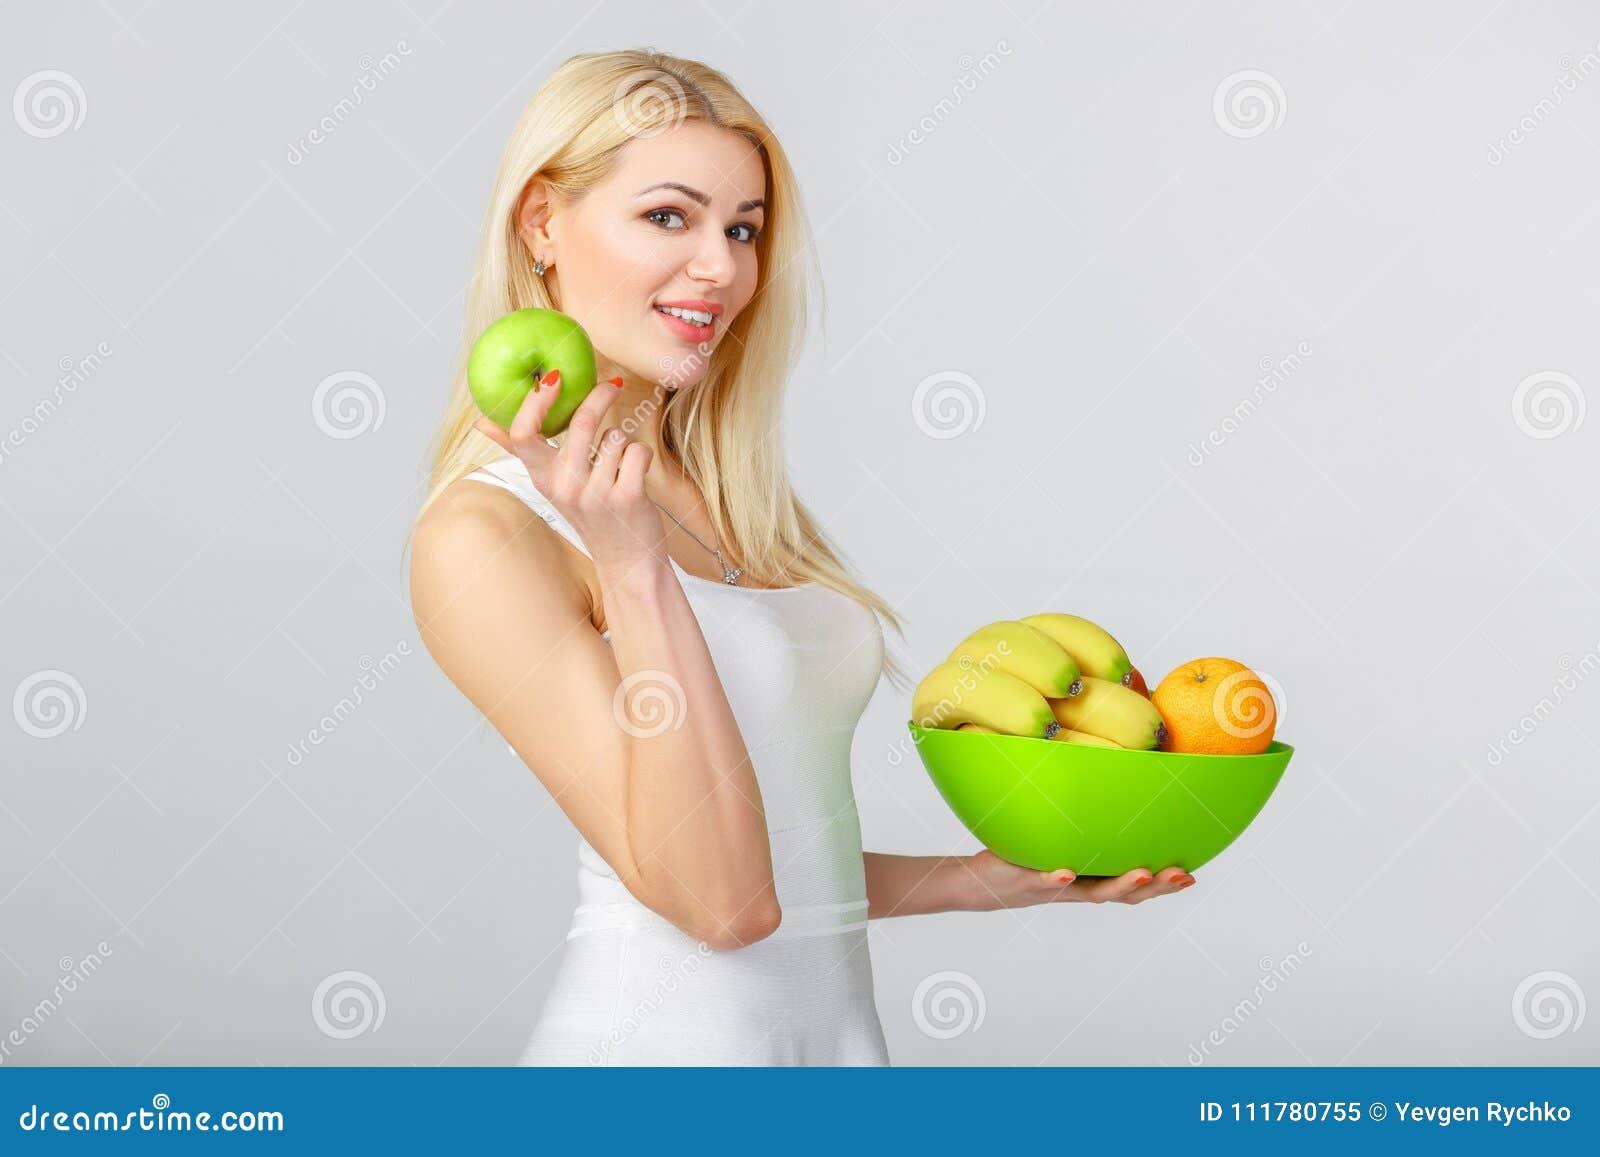 Woman in white dress showing fresh apple.